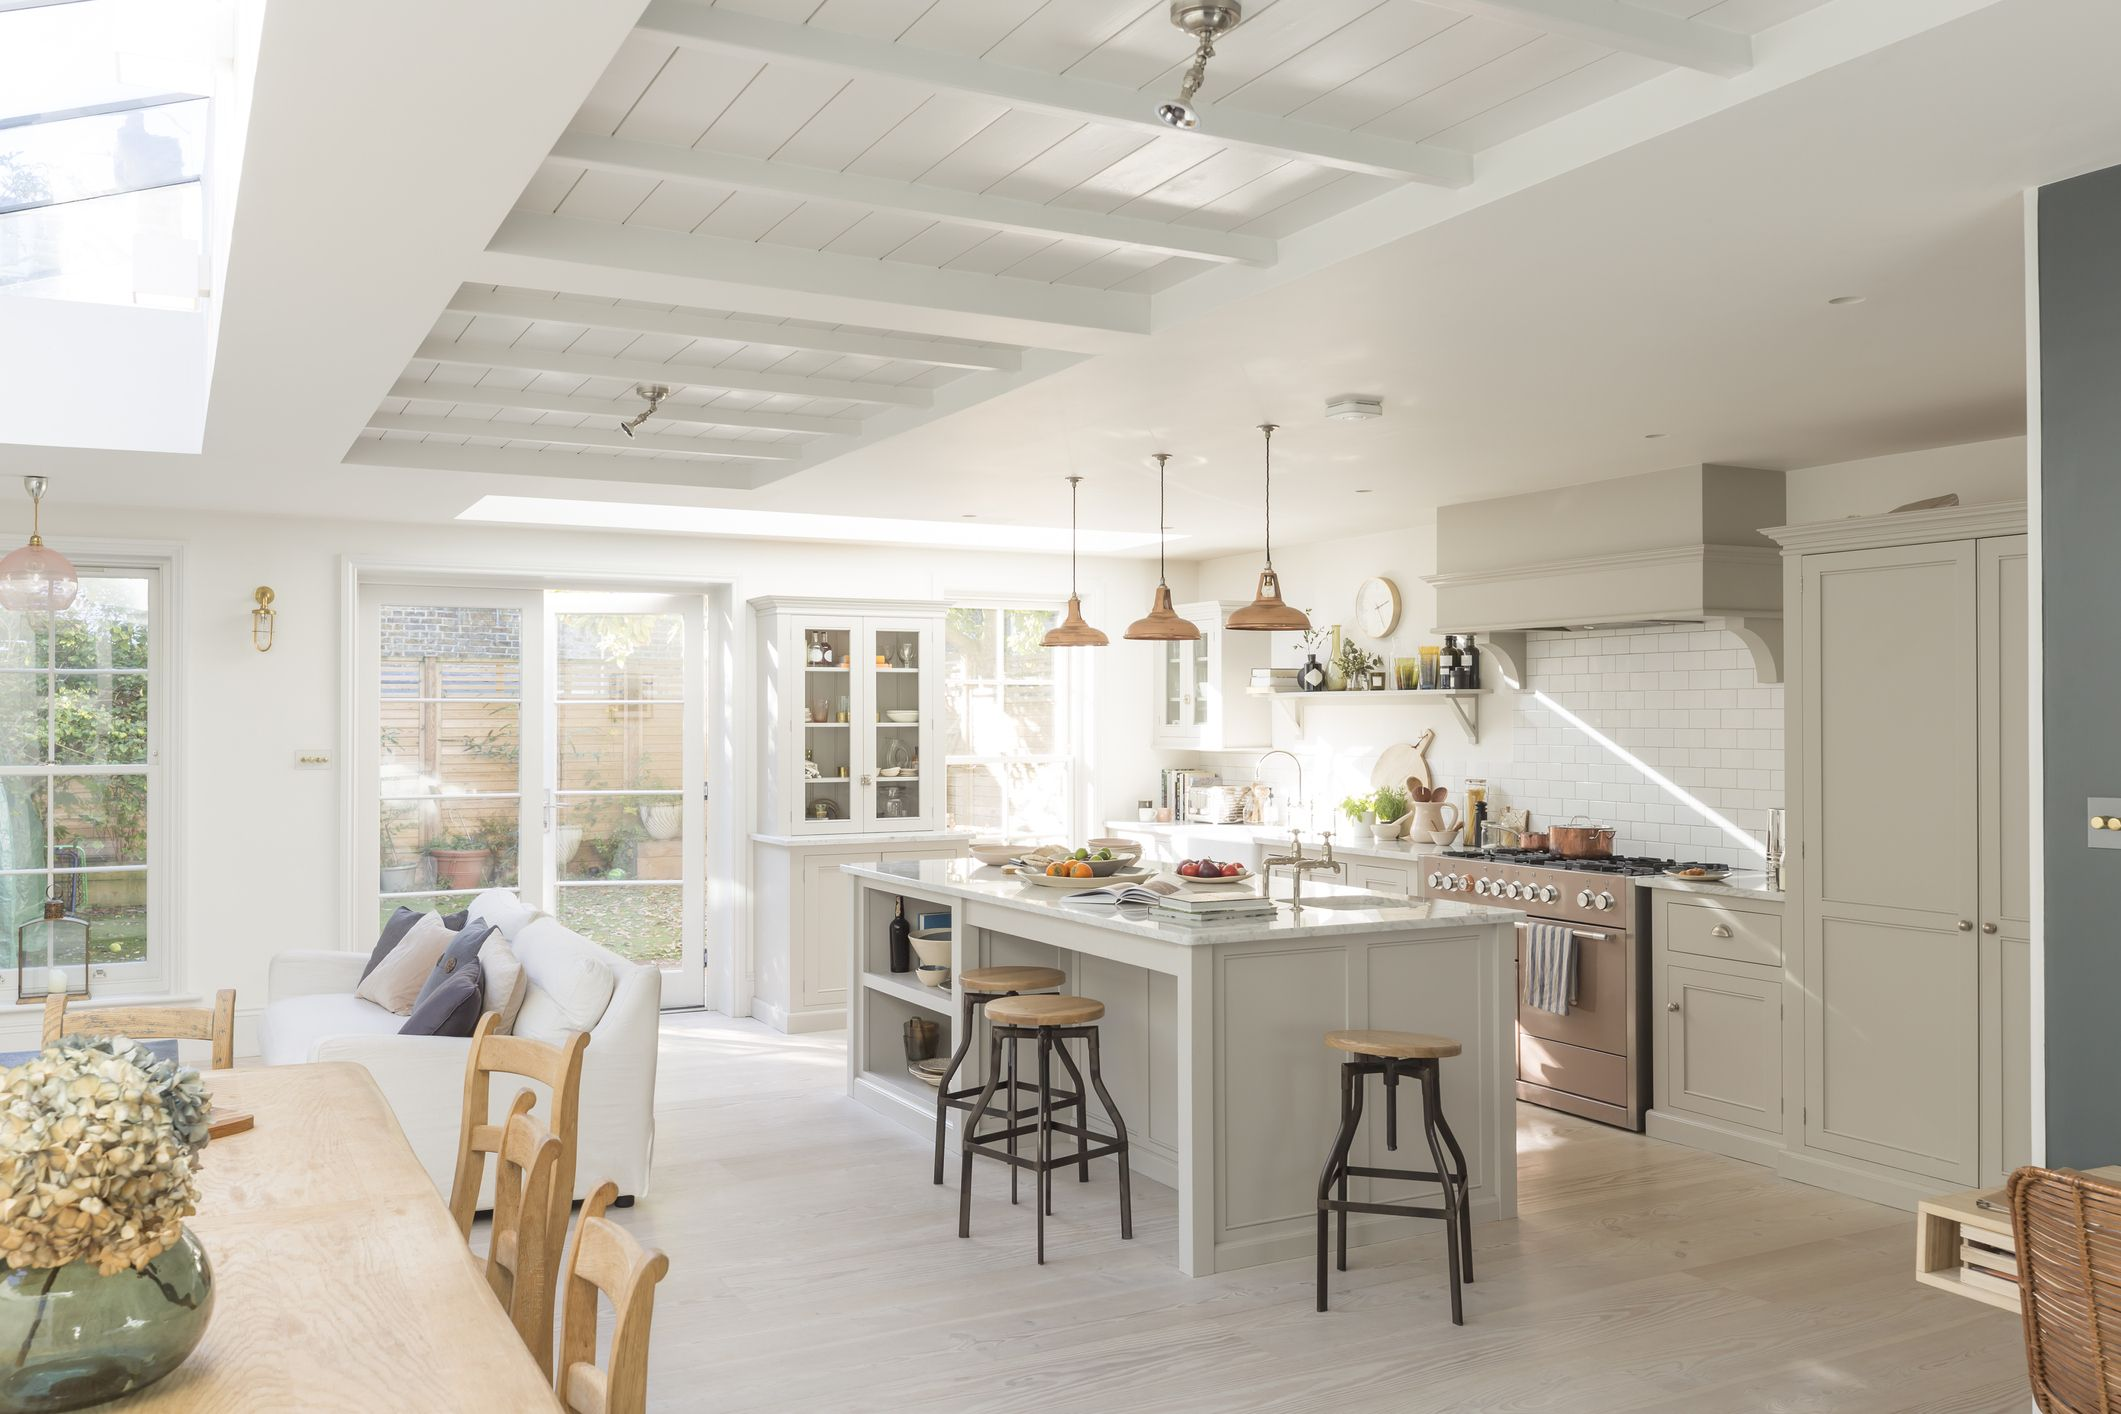 10 Best White Kitchen Cabinet Paint Colors  Painting